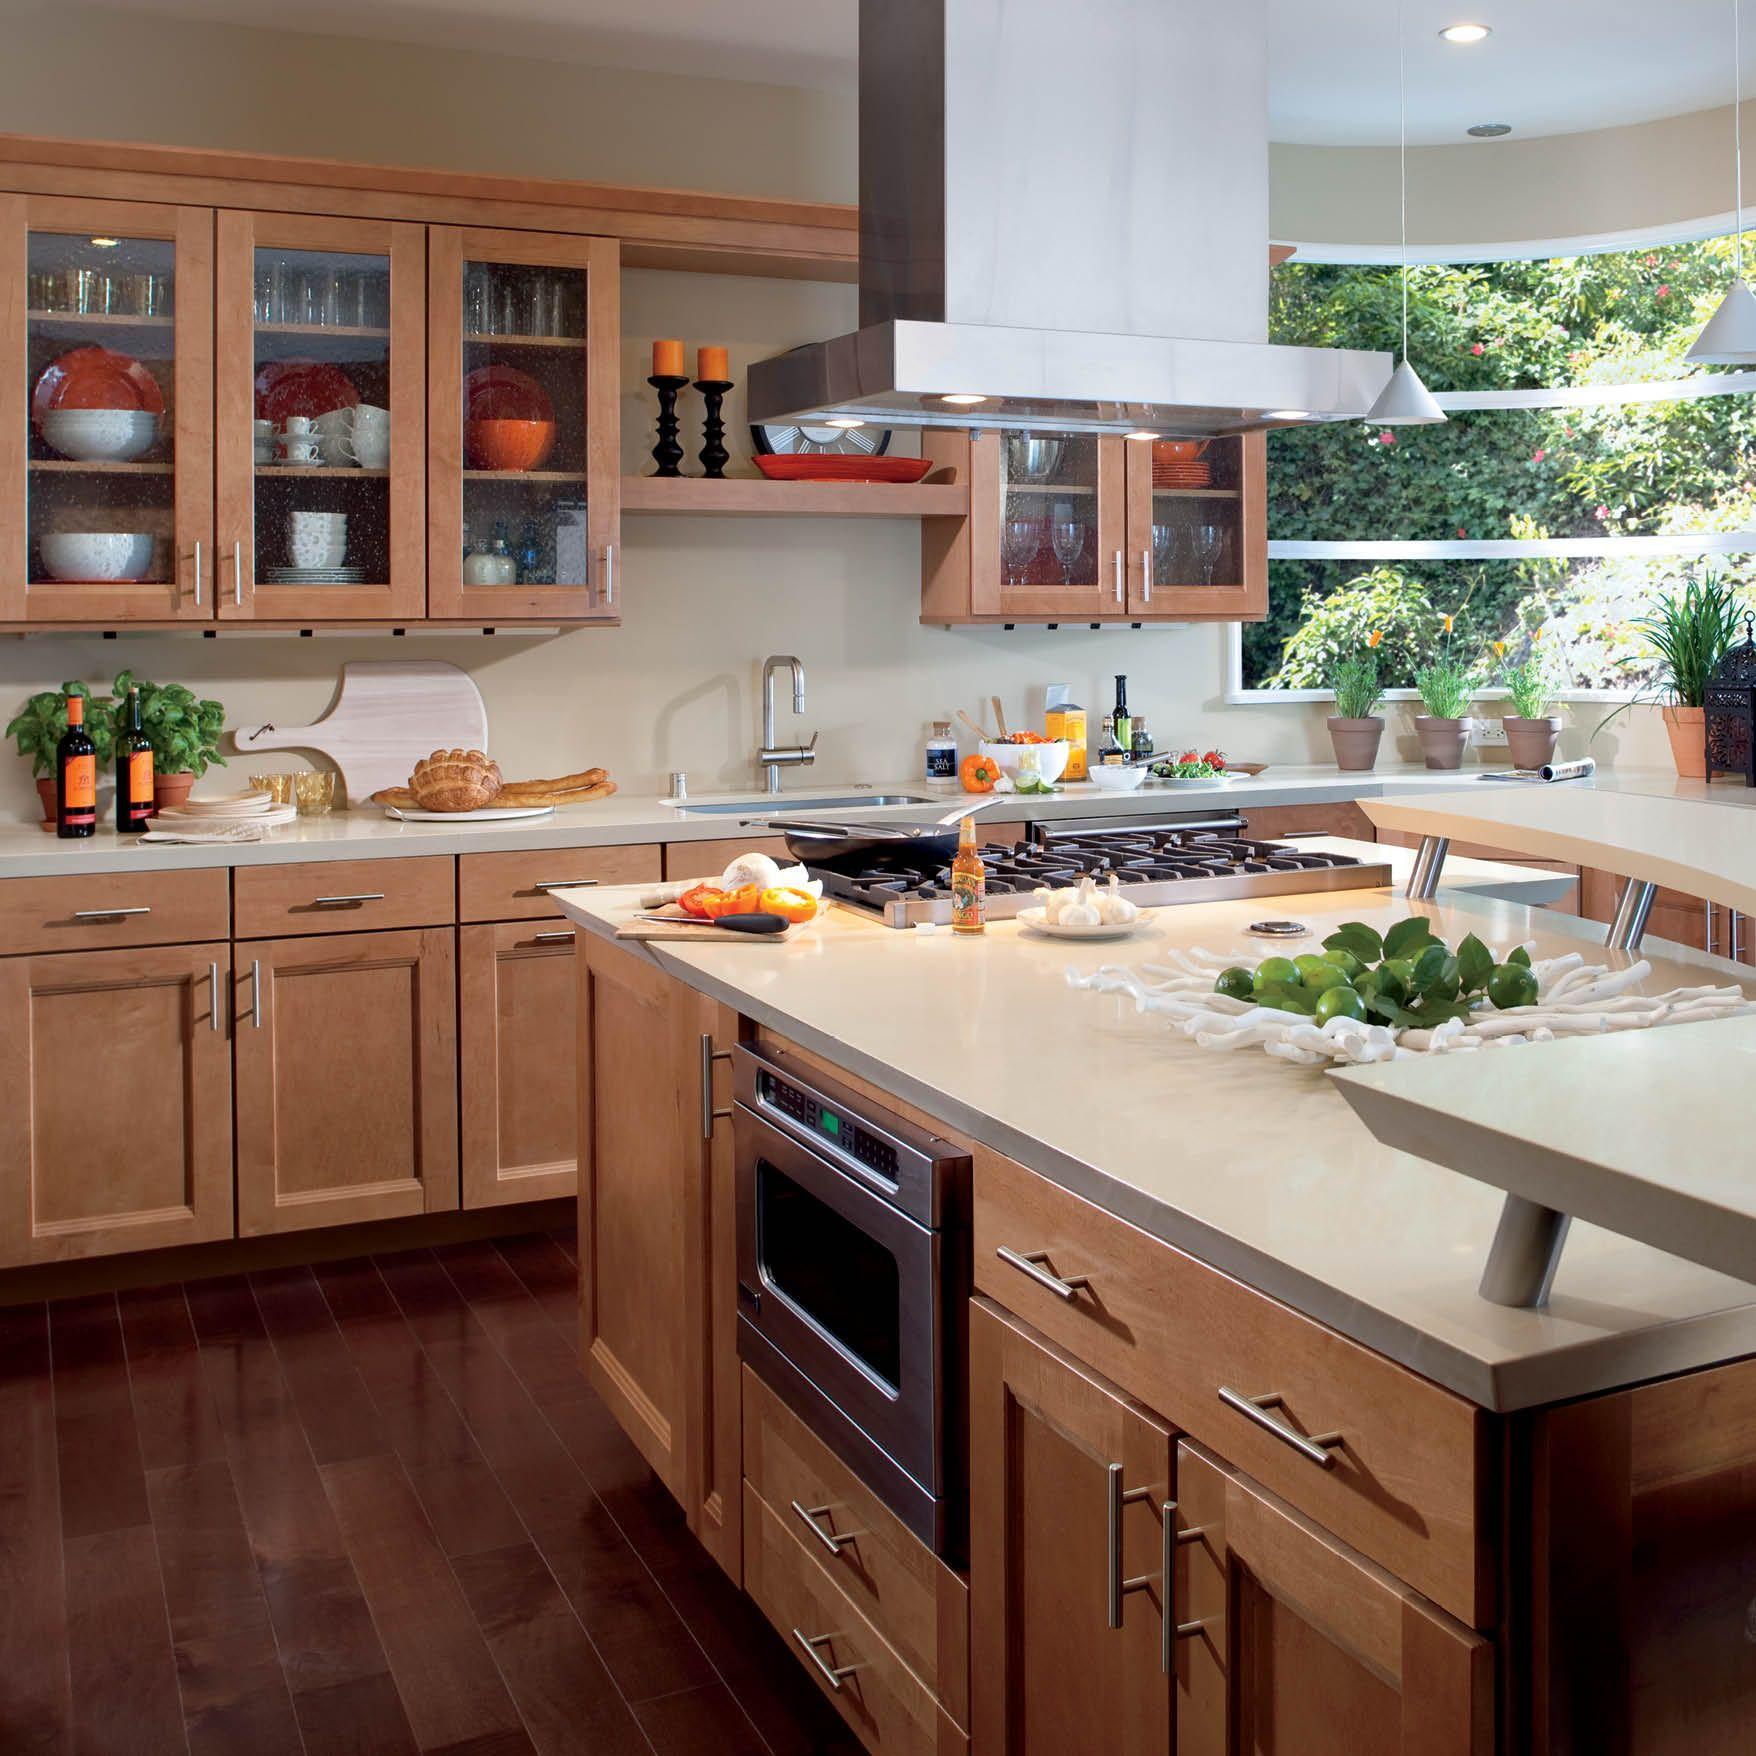 Selecting Wood Floors Maple Kitchen Cabinets Kitchen Design Interior Design Kitchen